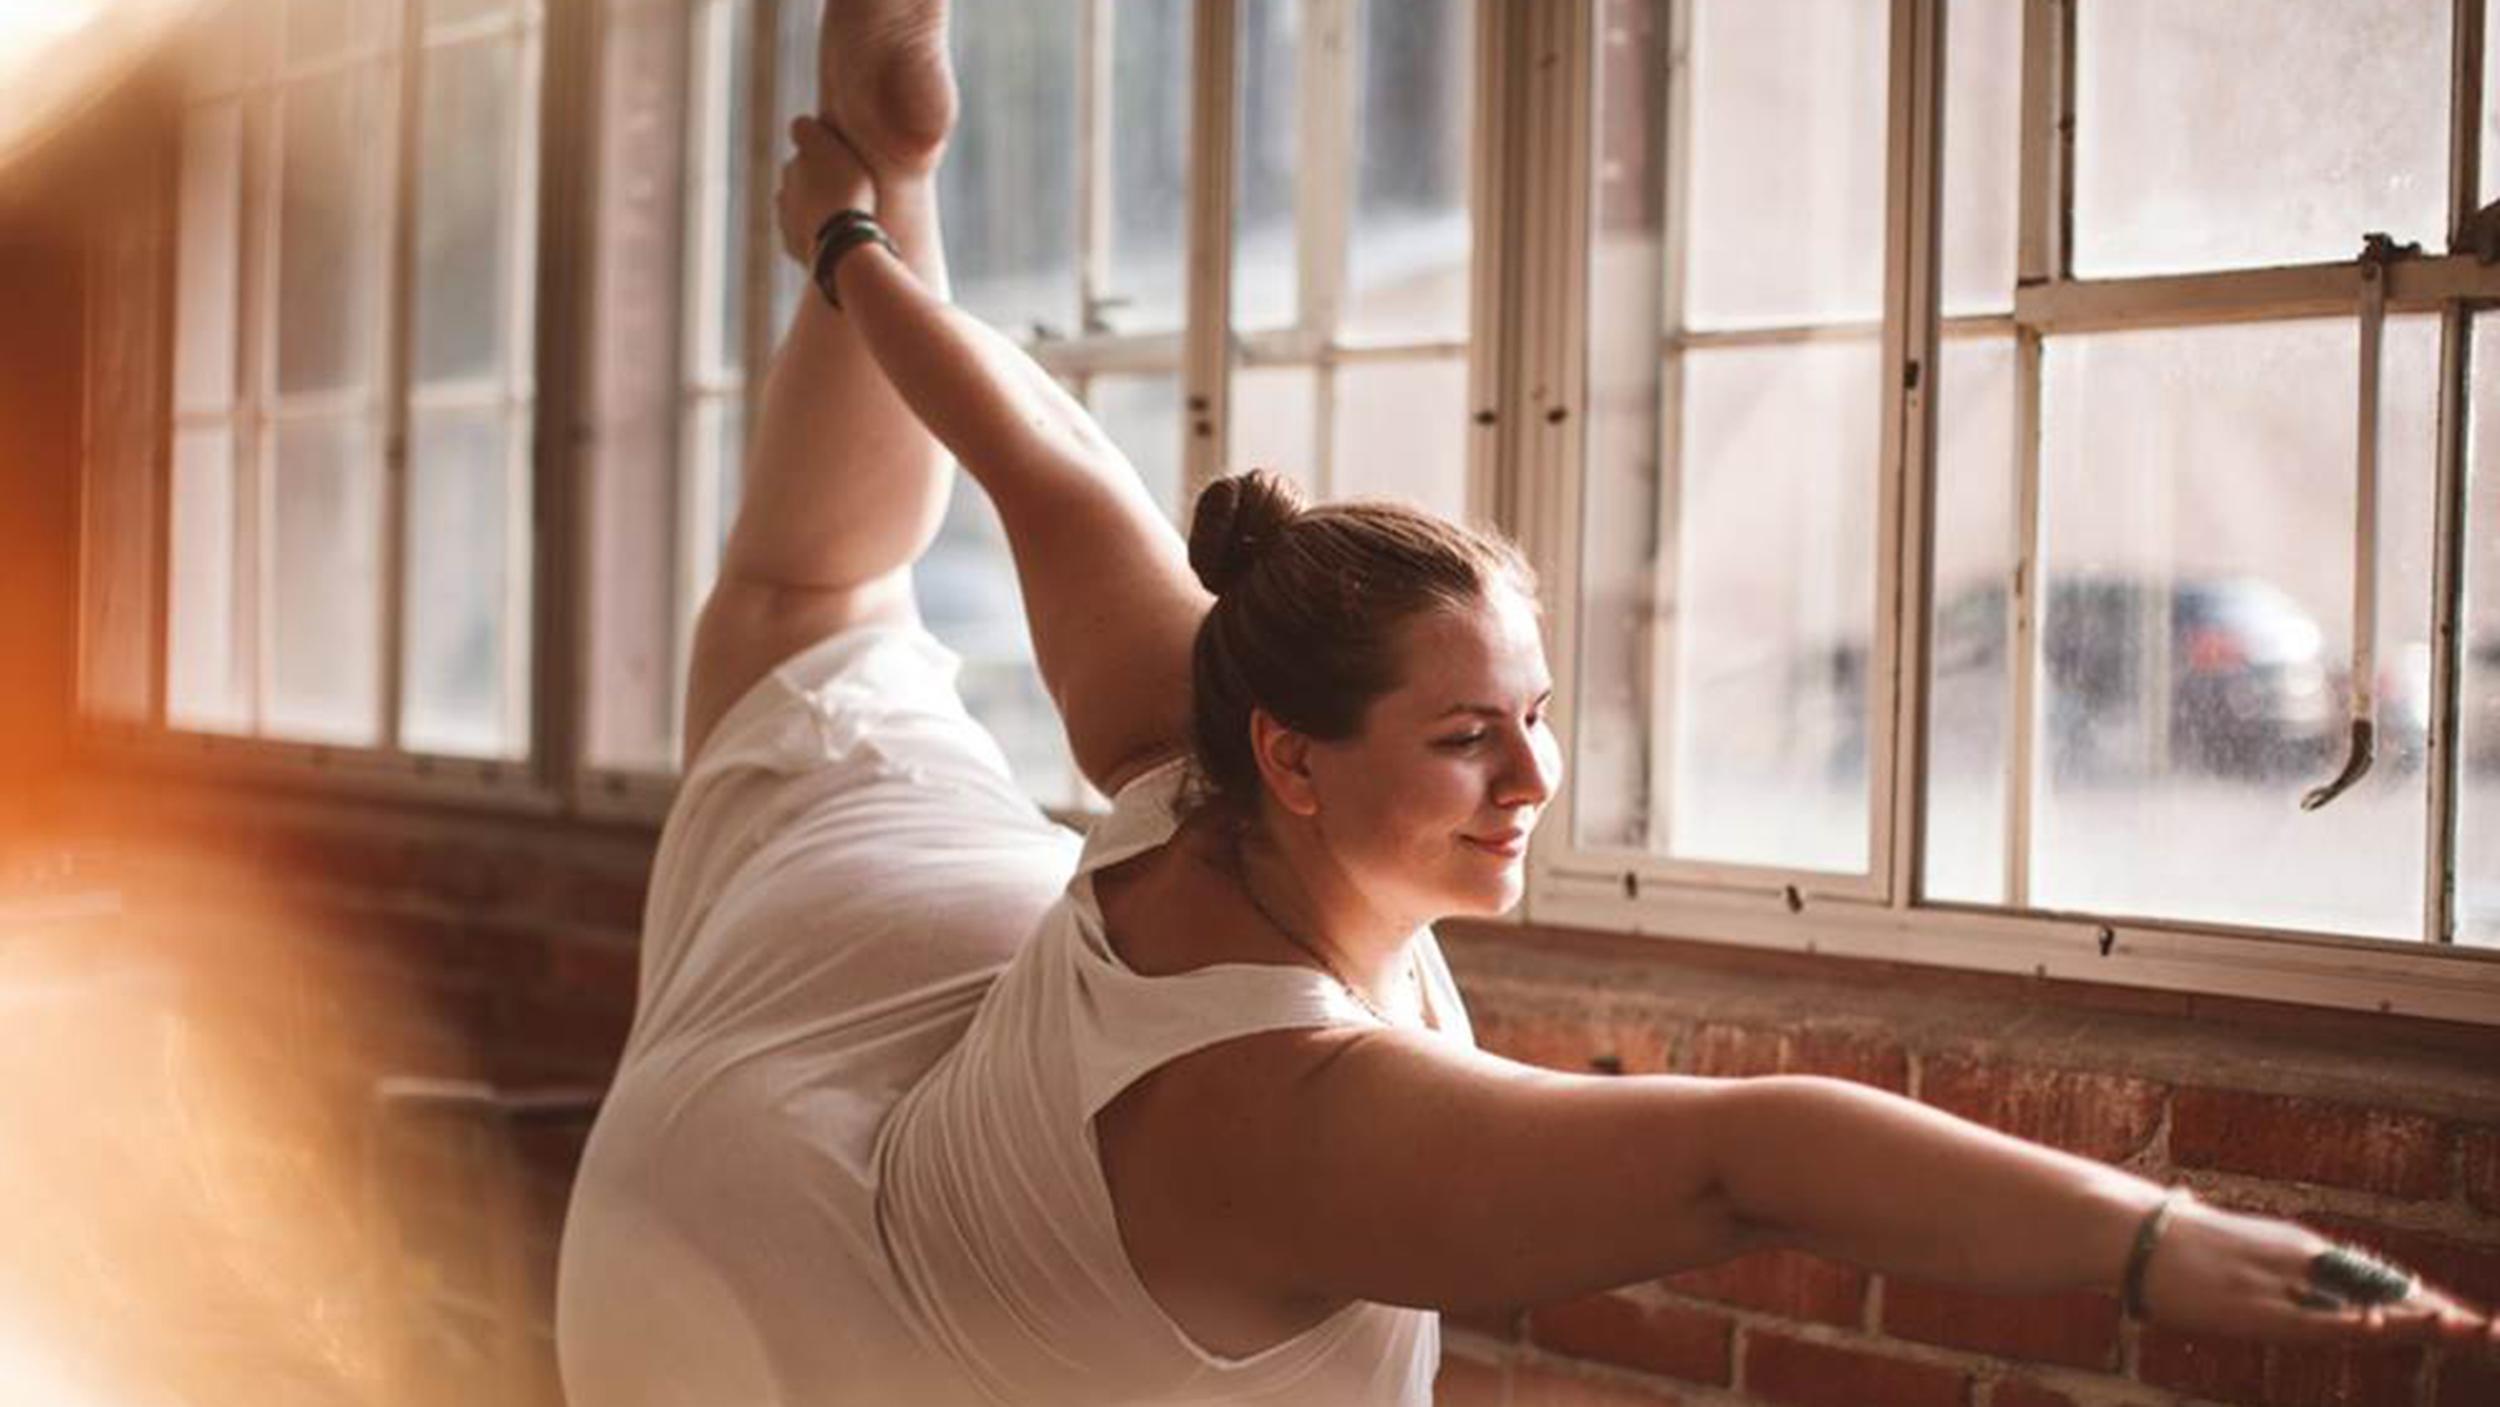 Body-positive yogi Dana Falsetti on how she found her confidence